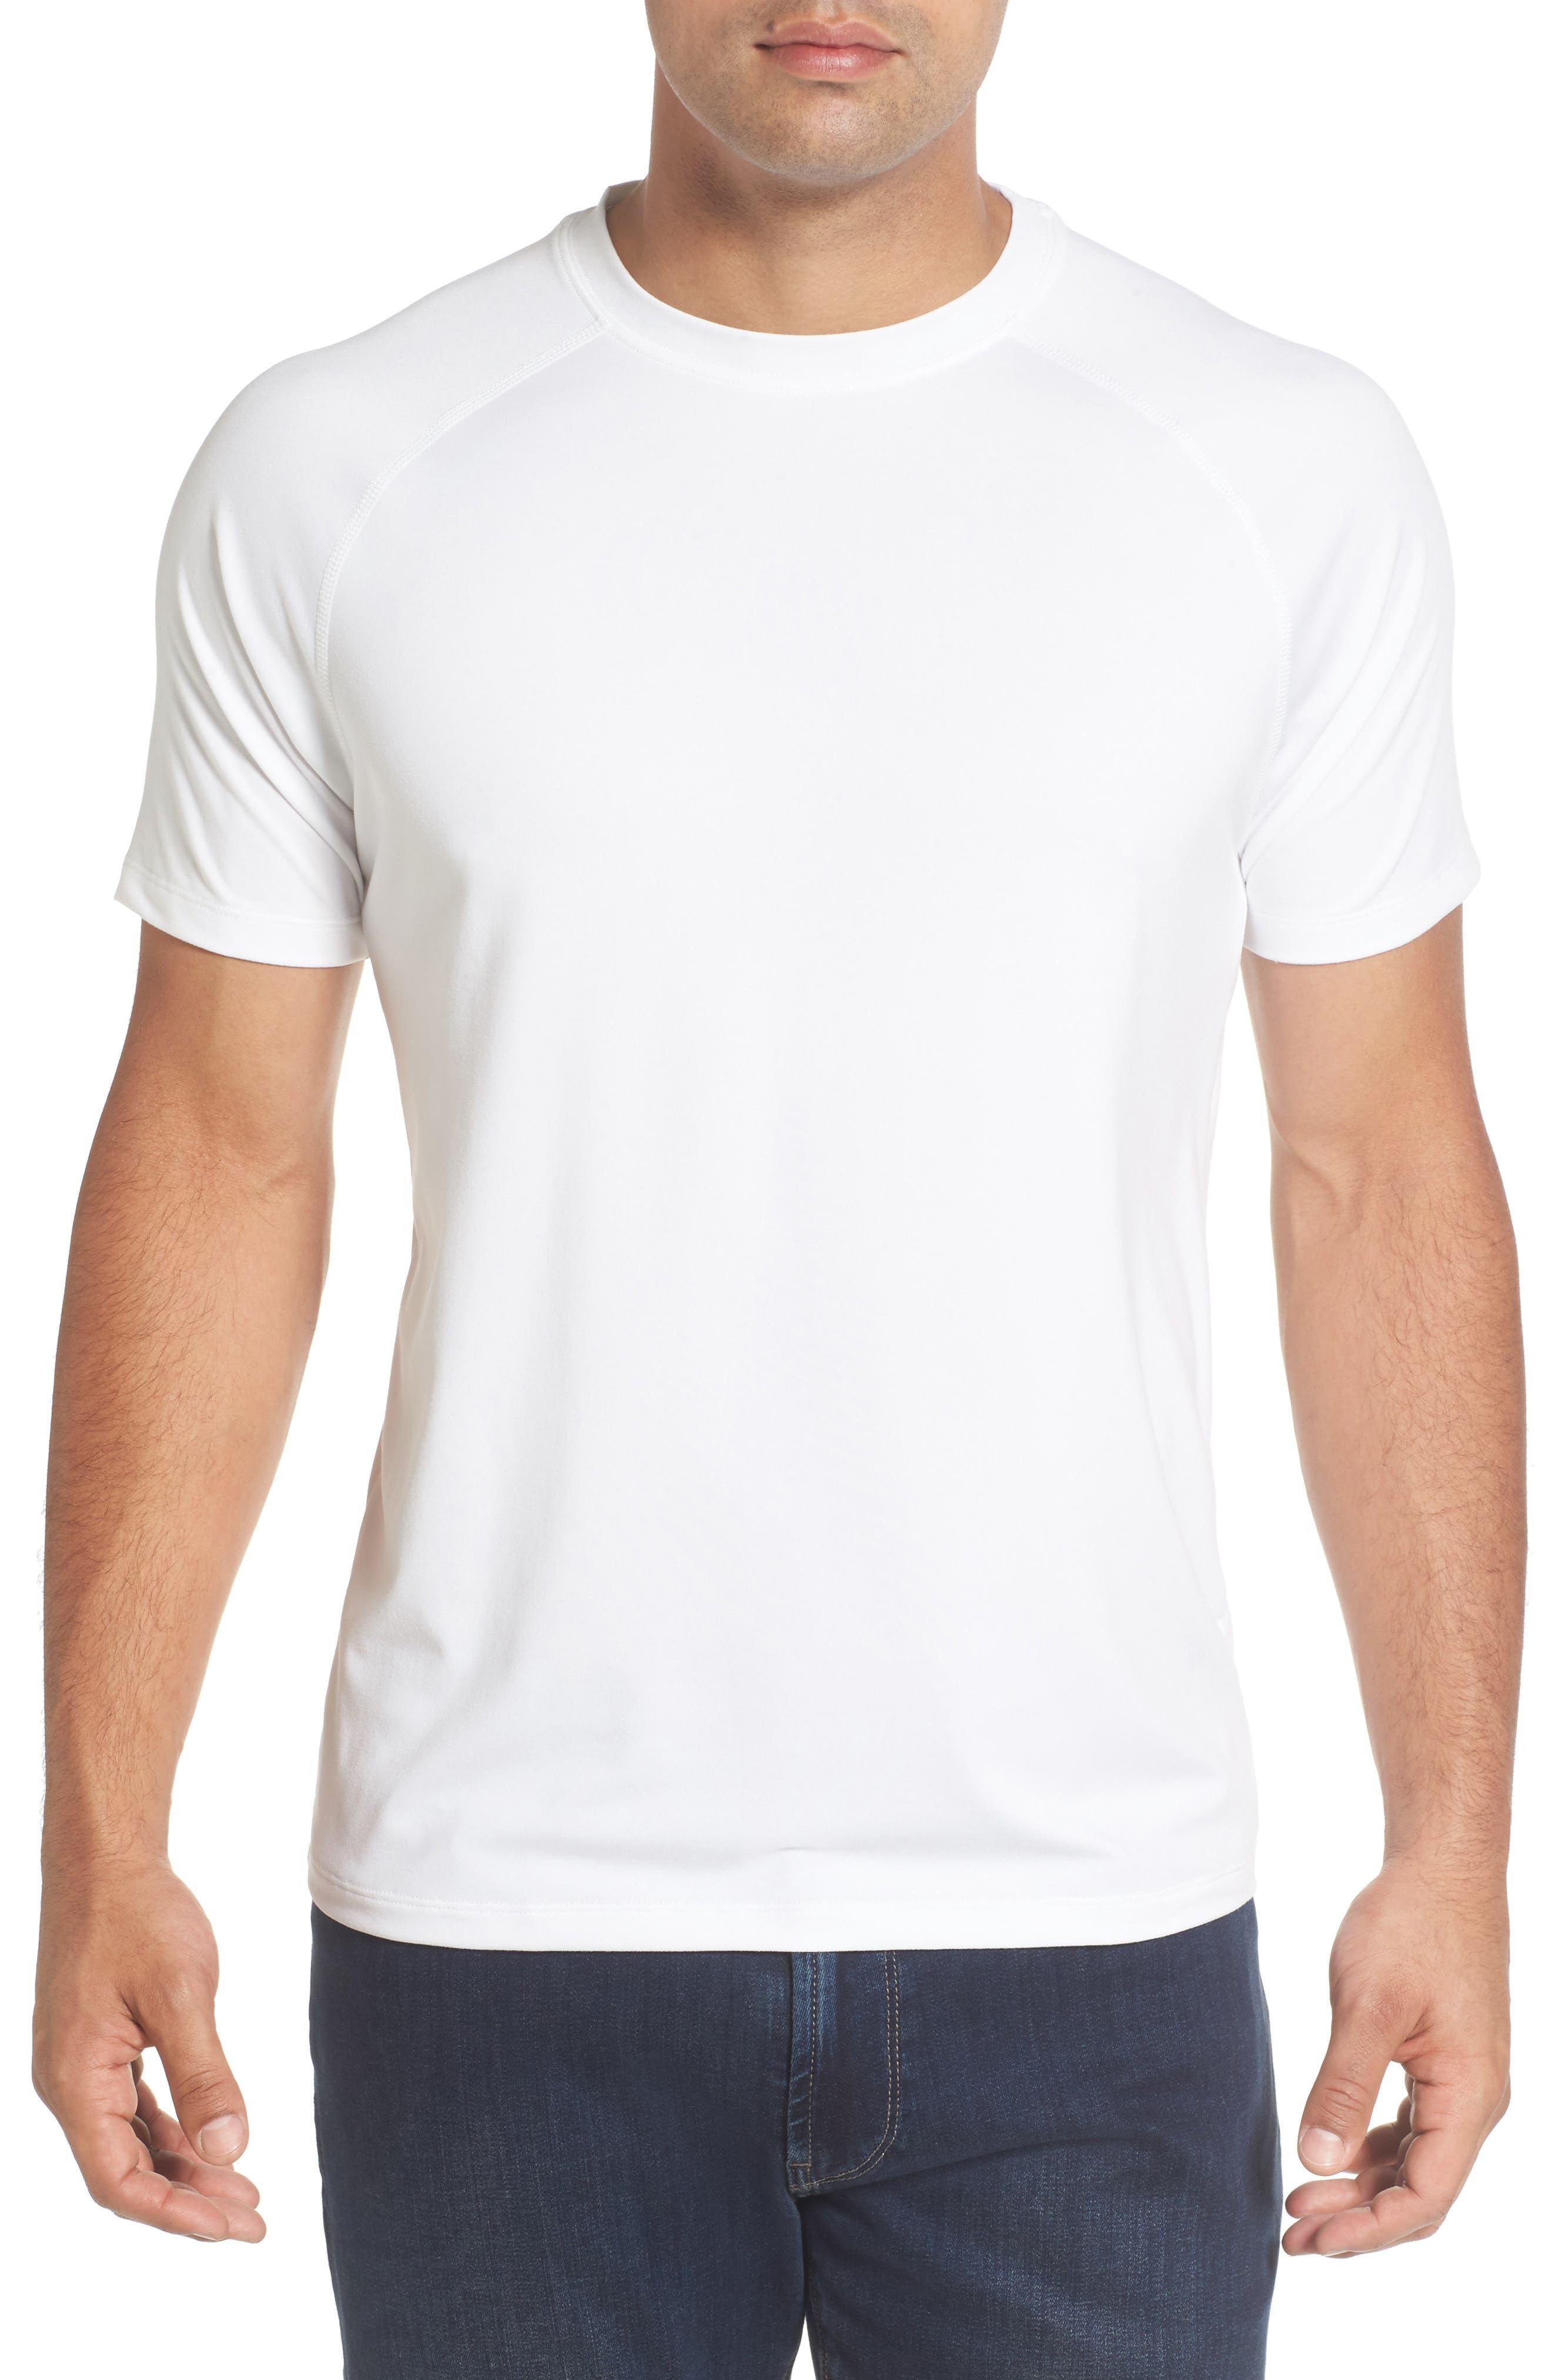 Rio Technical T-Shirt,                             Main thumbnail 1, color,                             White